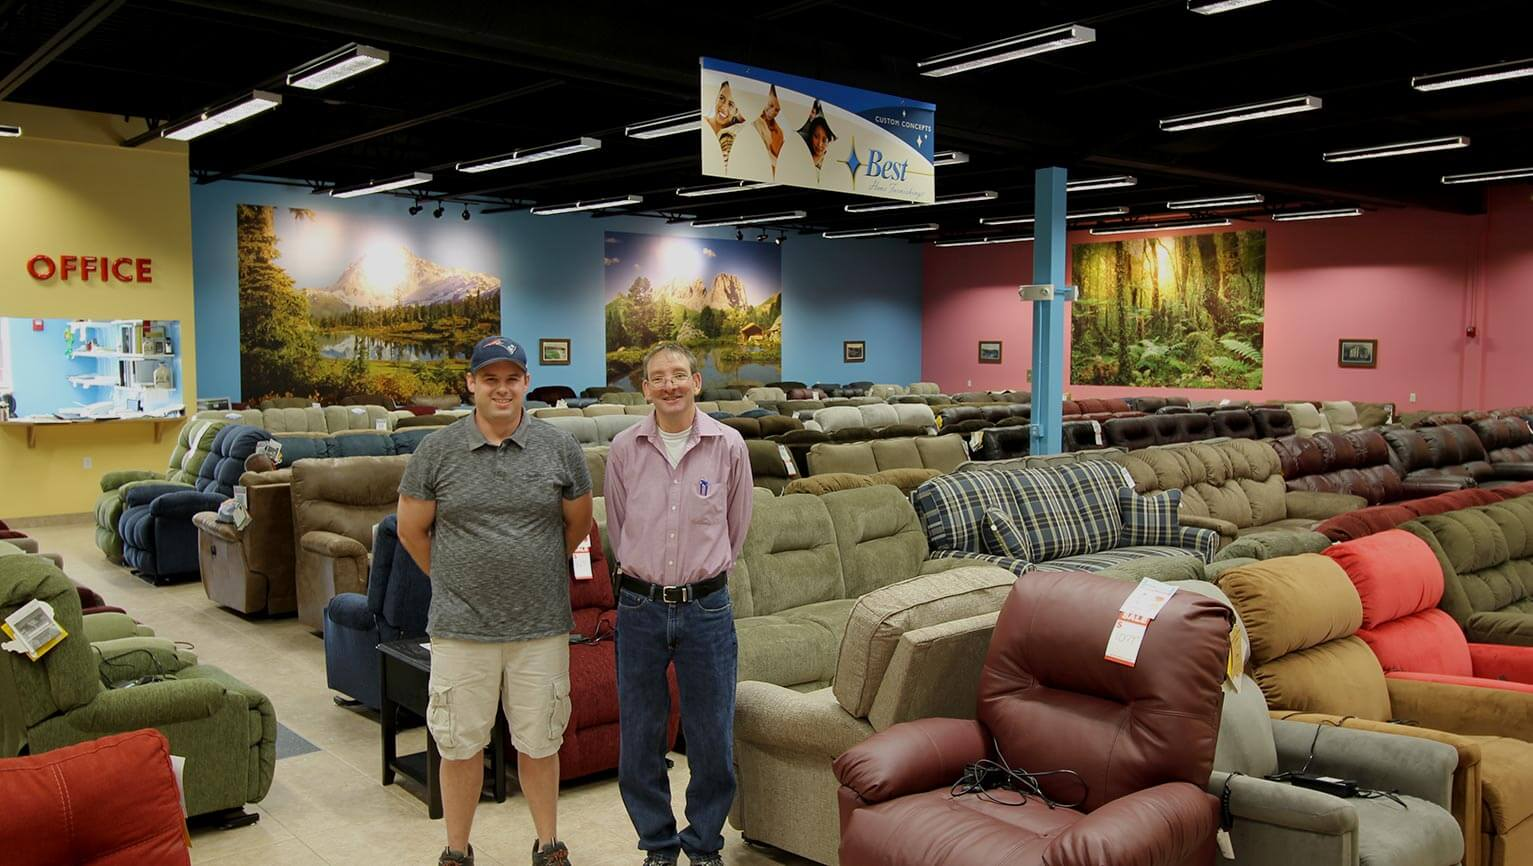 Furniture Stores In Claremont Nh Local Furniture Store In Walpole Nh Aumand S Bobs Furniture